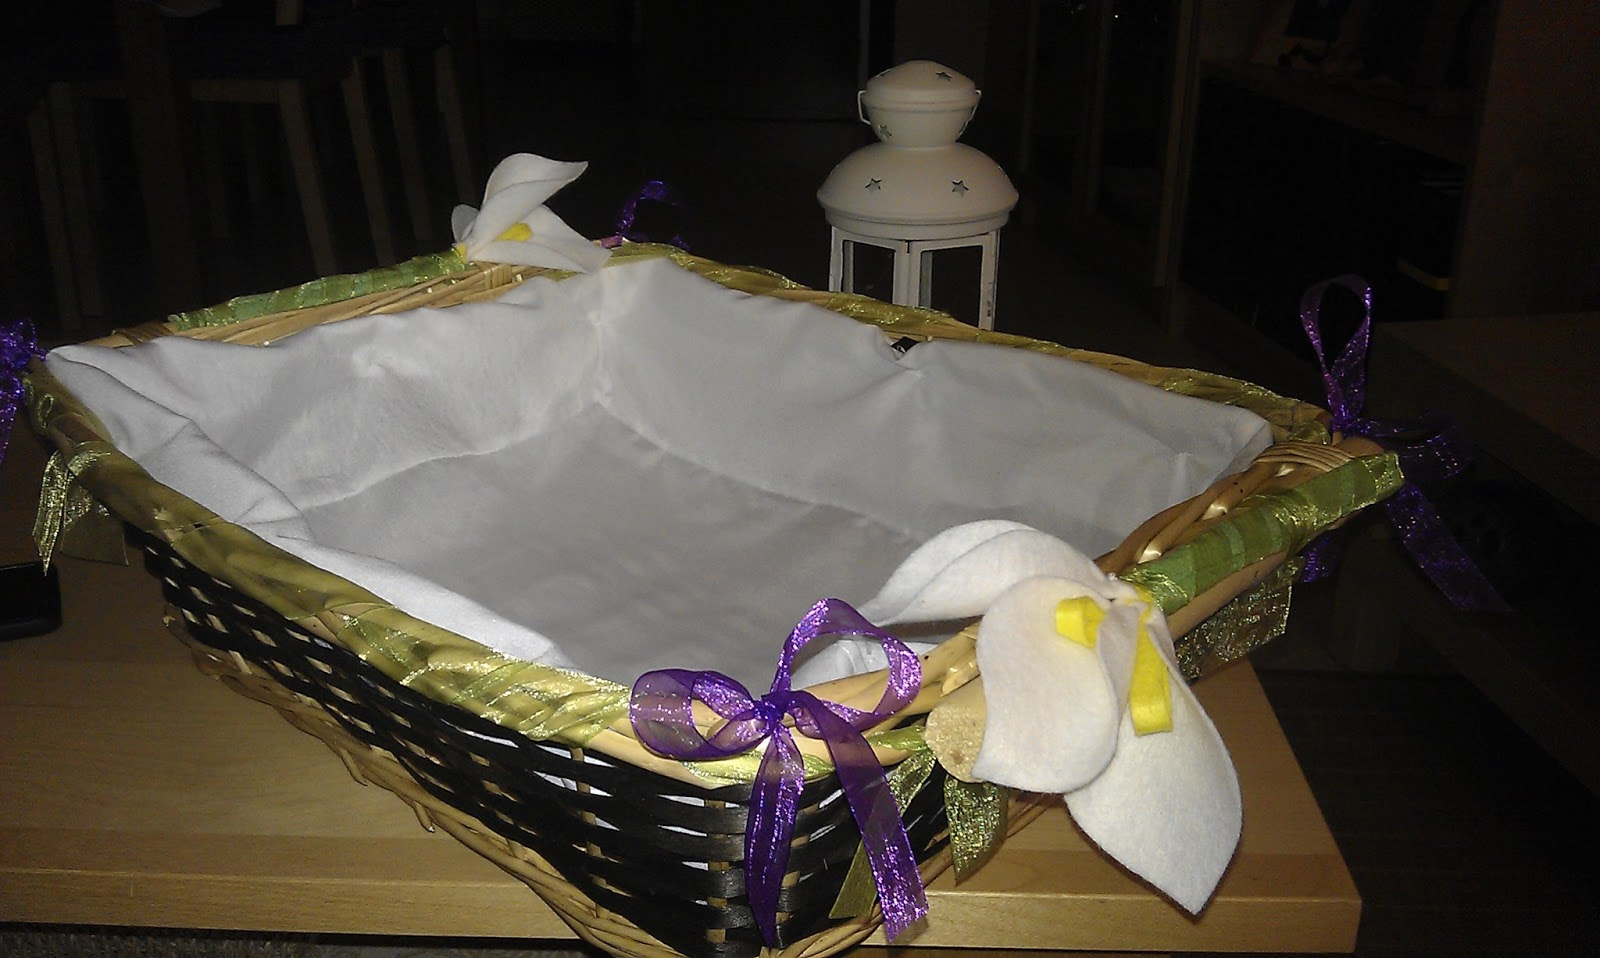 C mo adornar una cesta de mimbre para boda imagui - Como decorar una cesta de mimbre ...